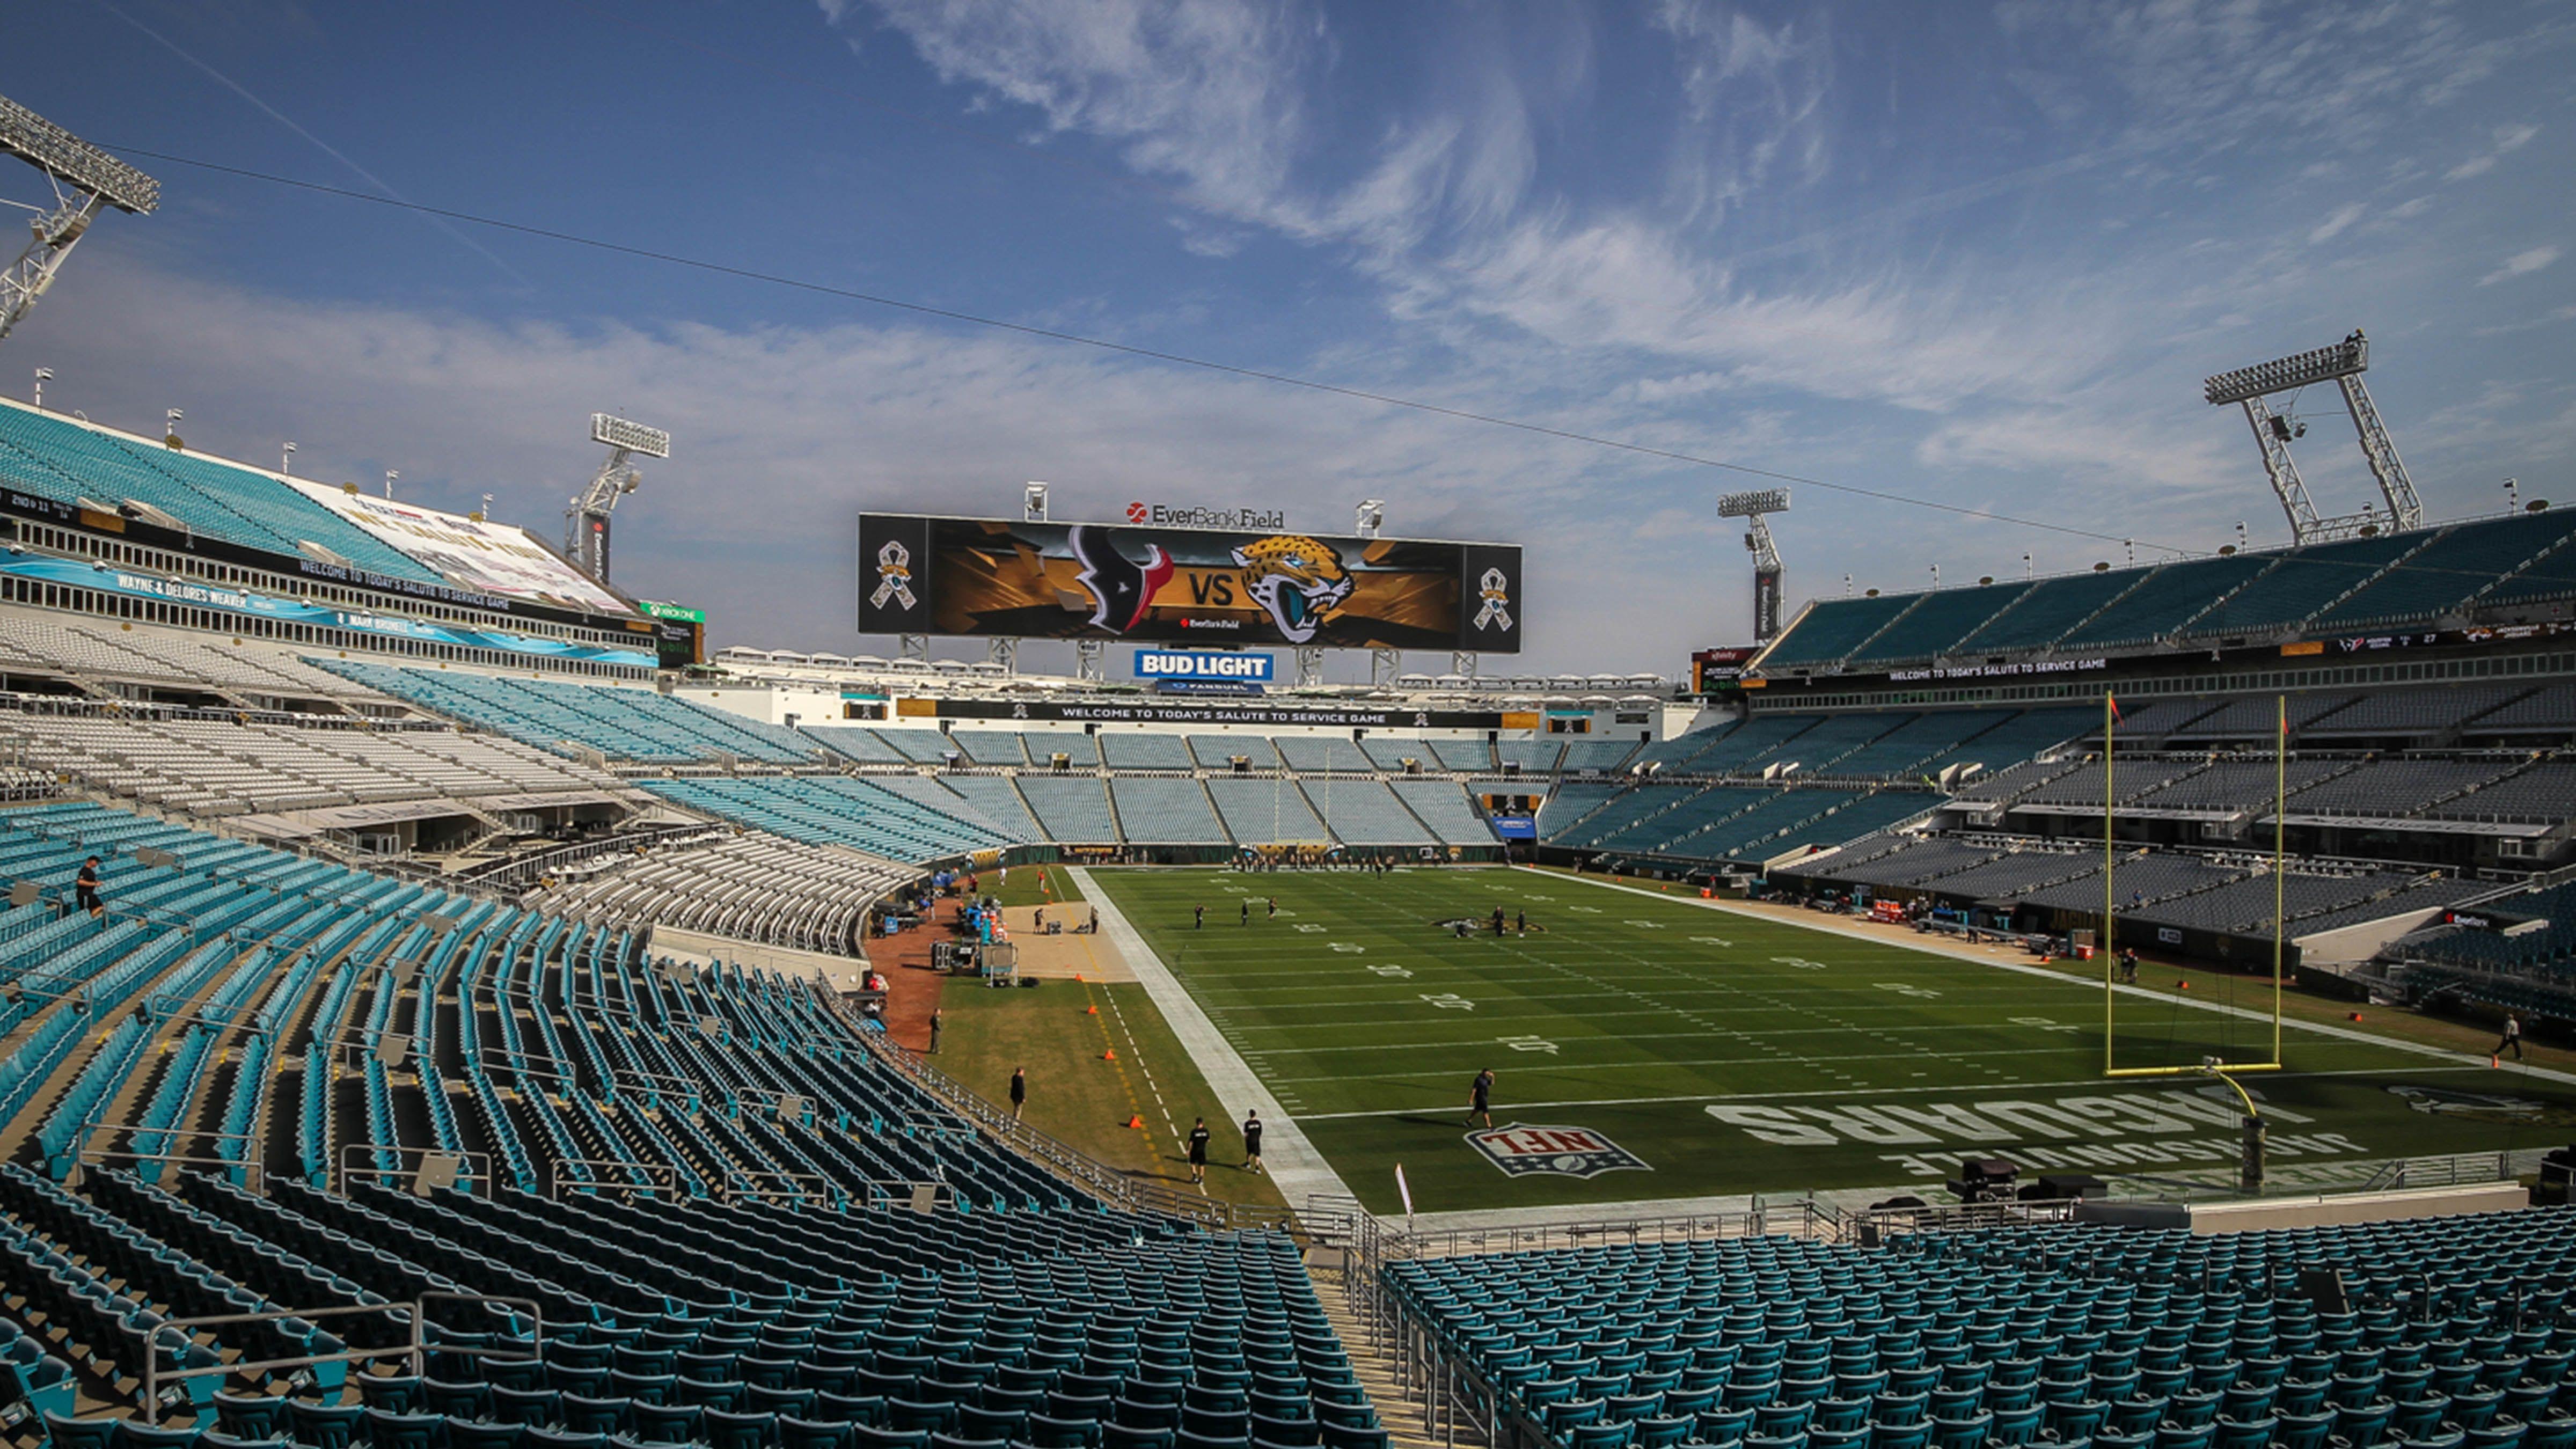 At Jacksonville Jaguars